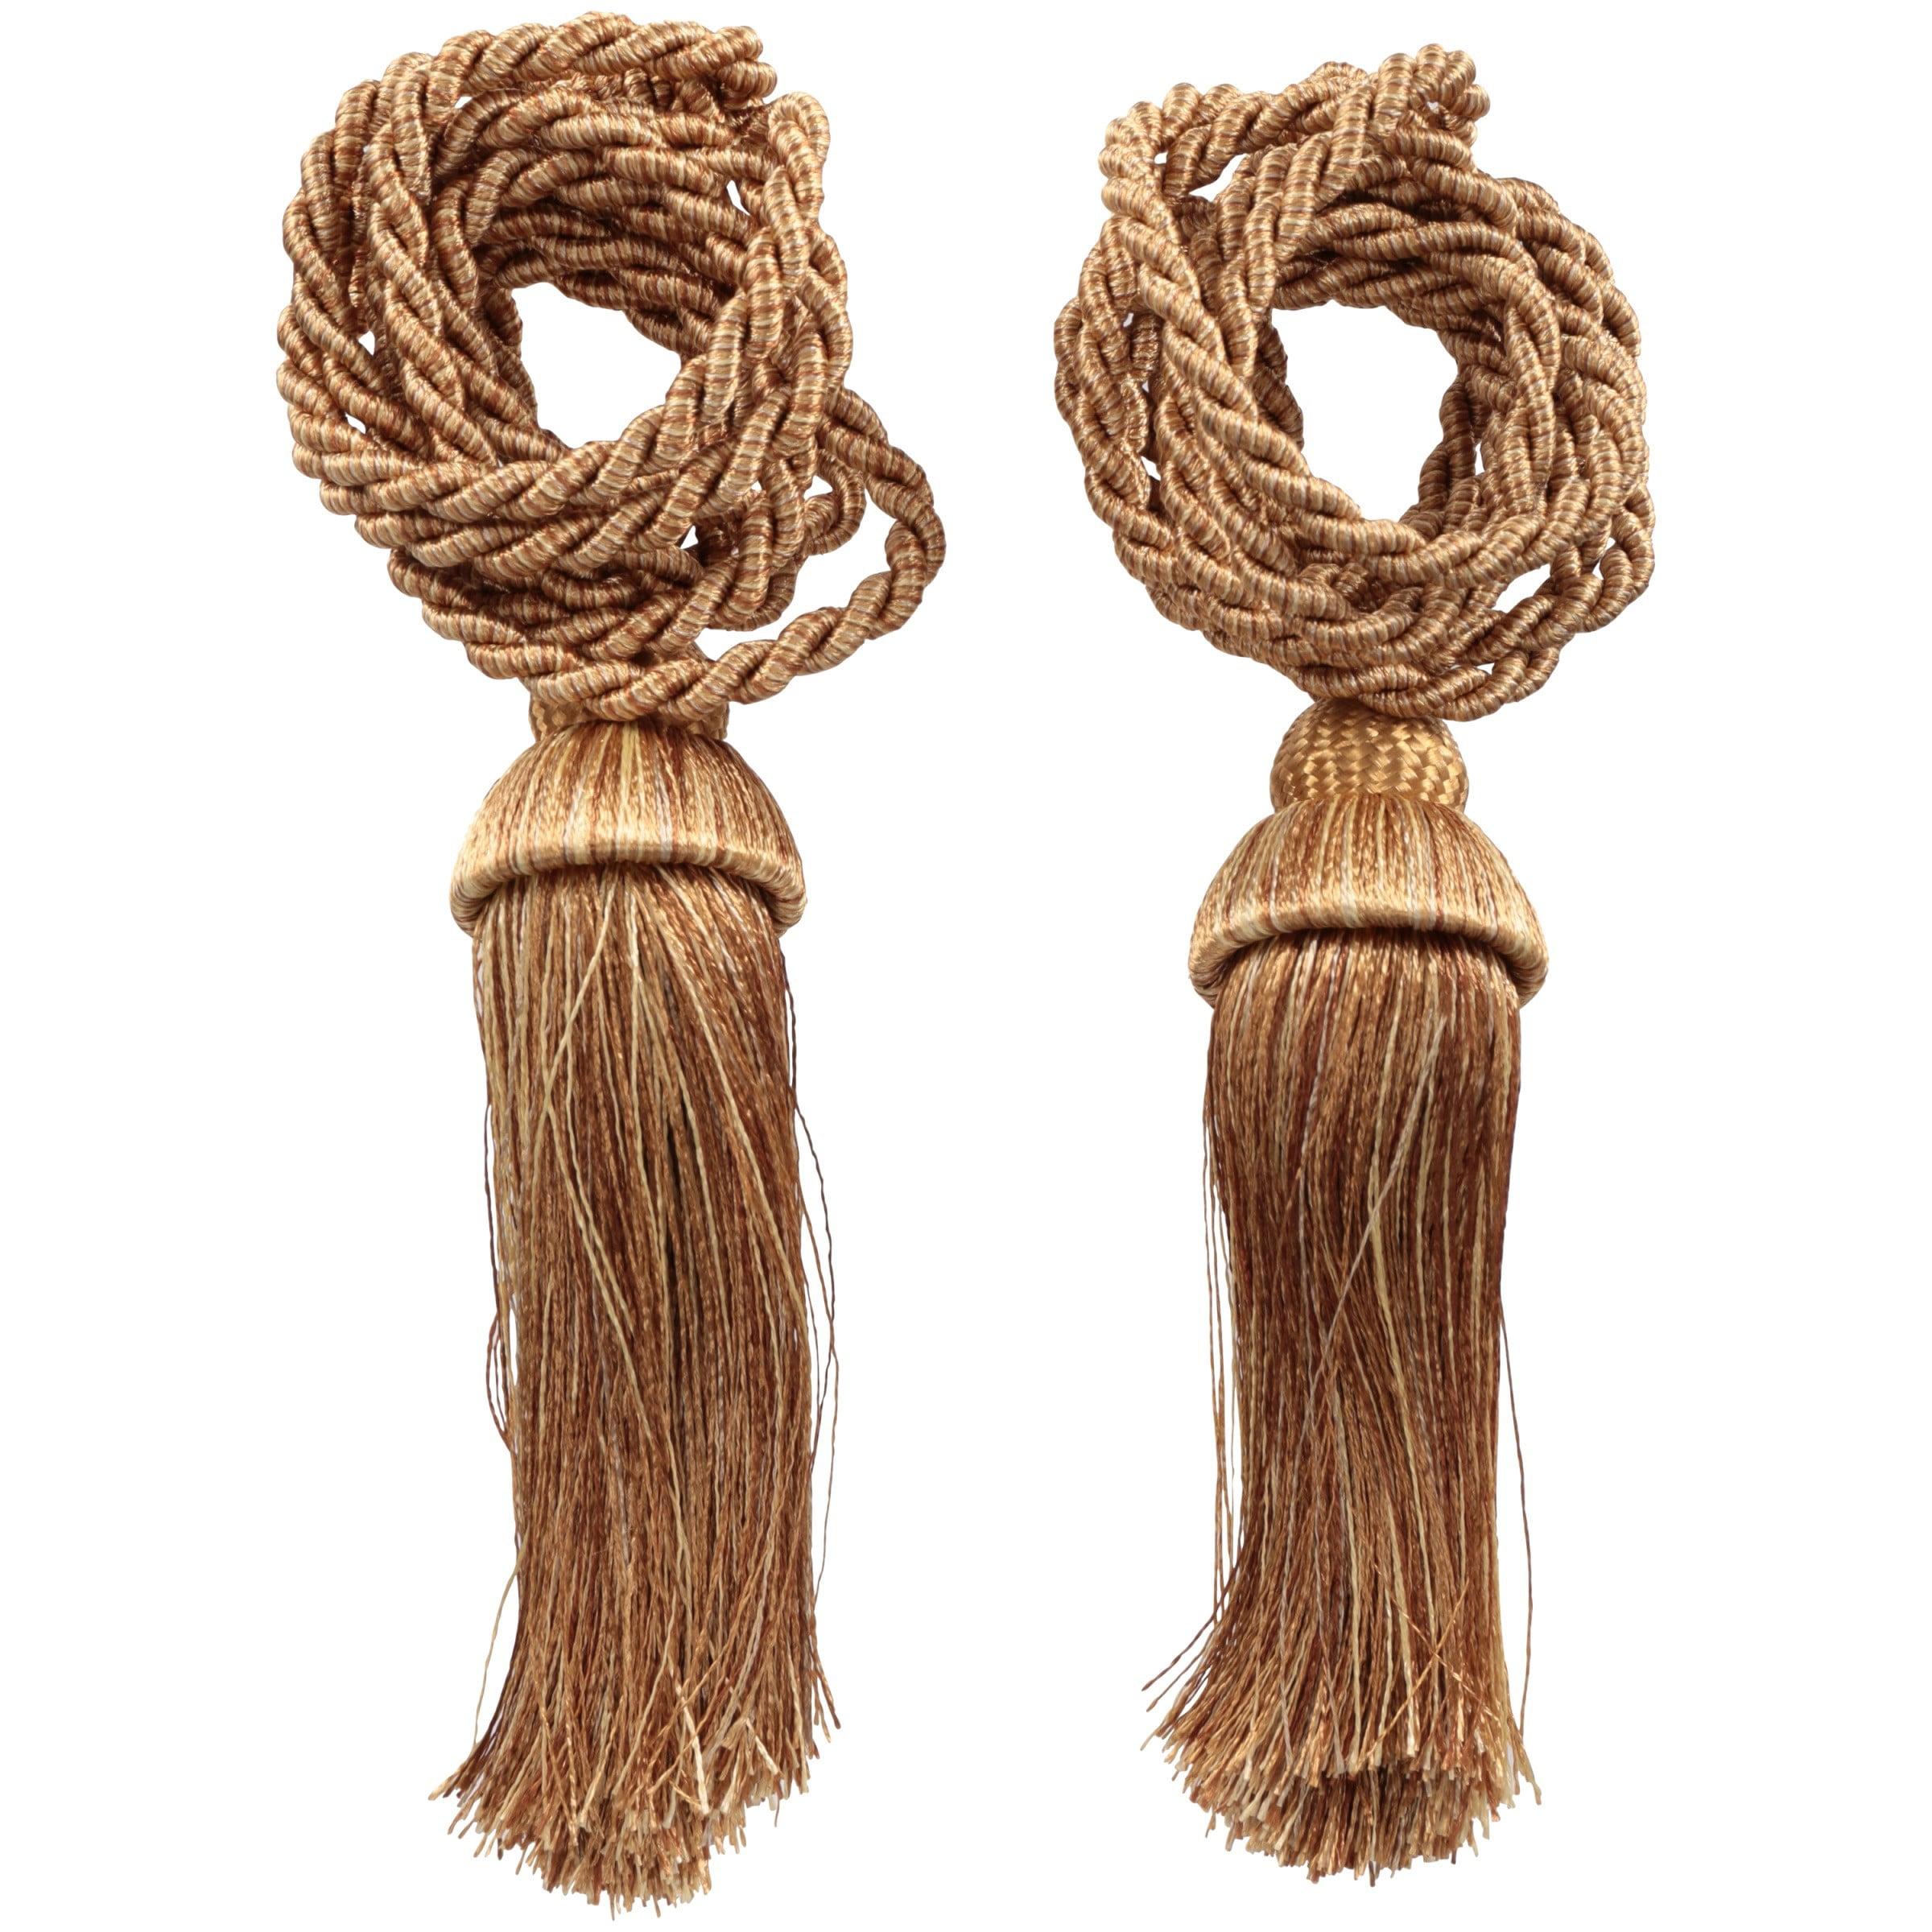 Mainstays Tassel Curtain Tie Backs 2 Pack Walmart Com